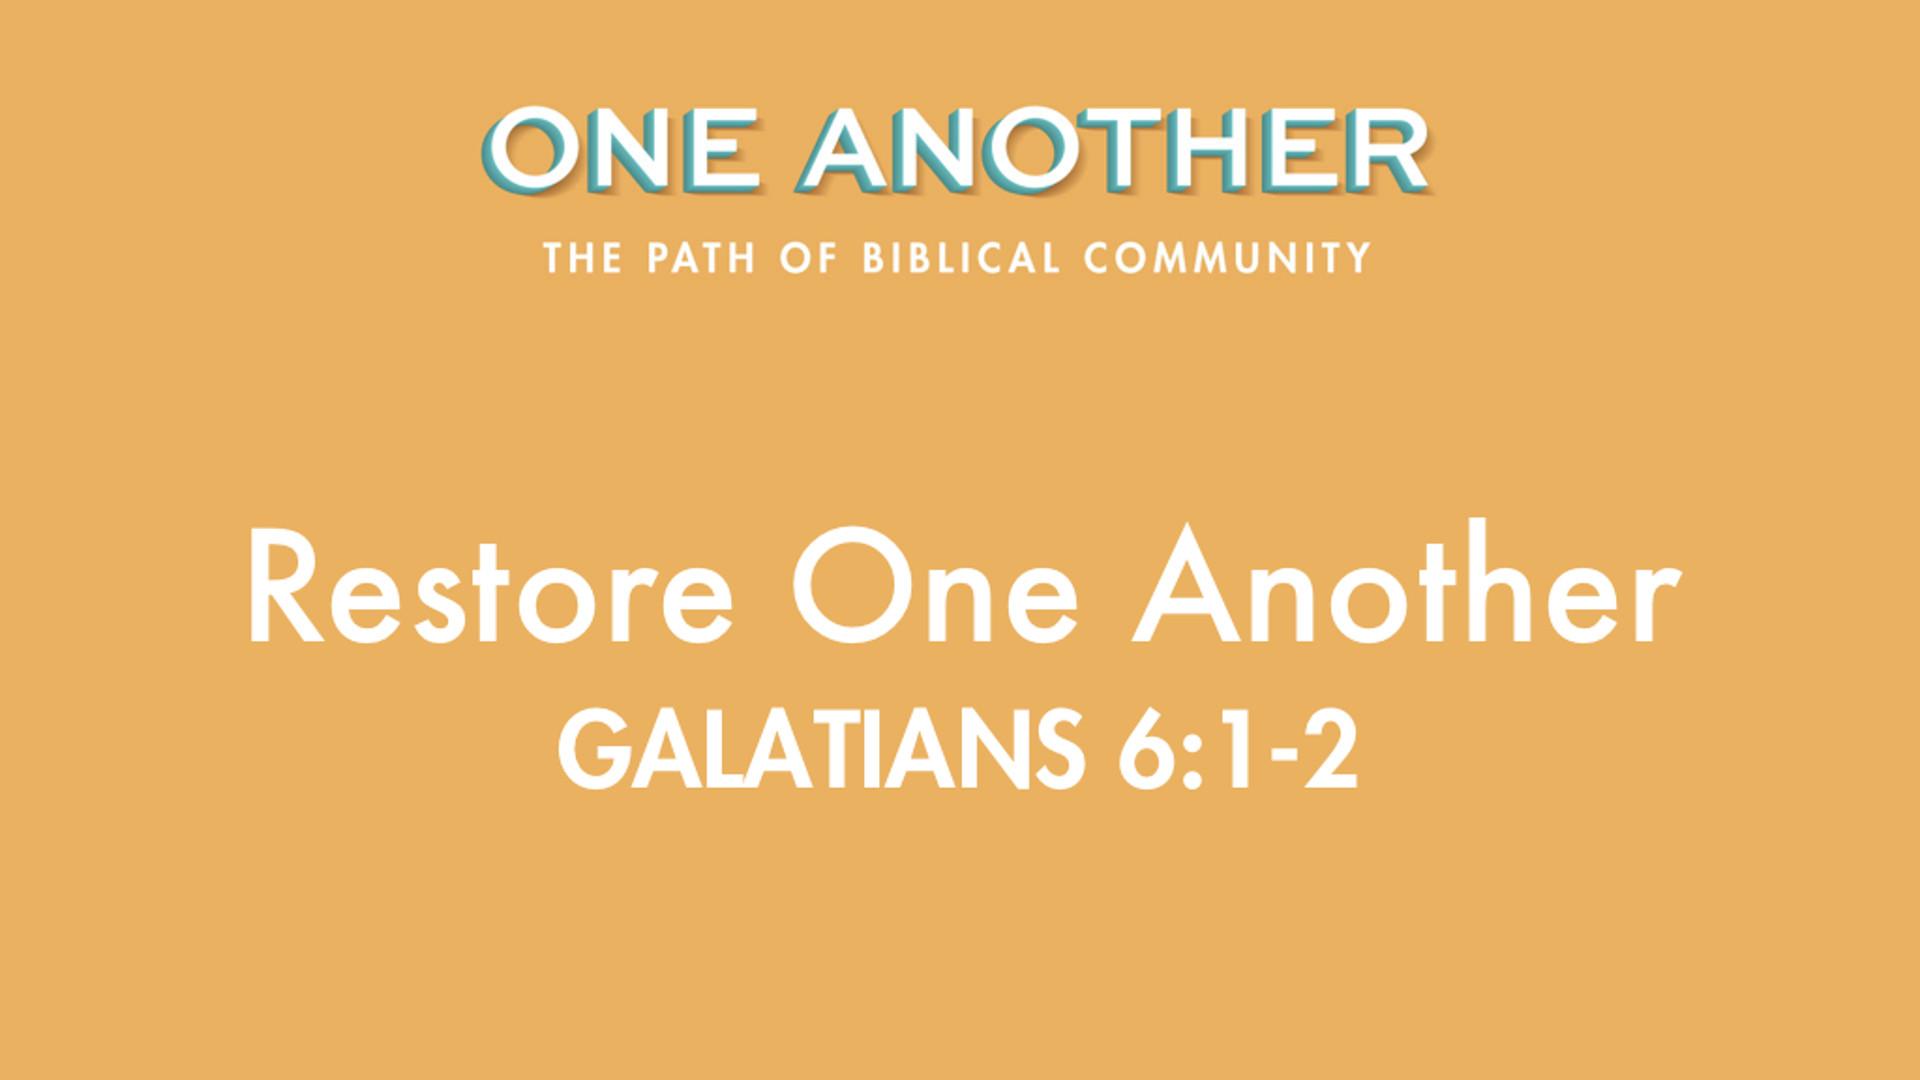 10Restore One Another - Galatians 6.1-2.jpg